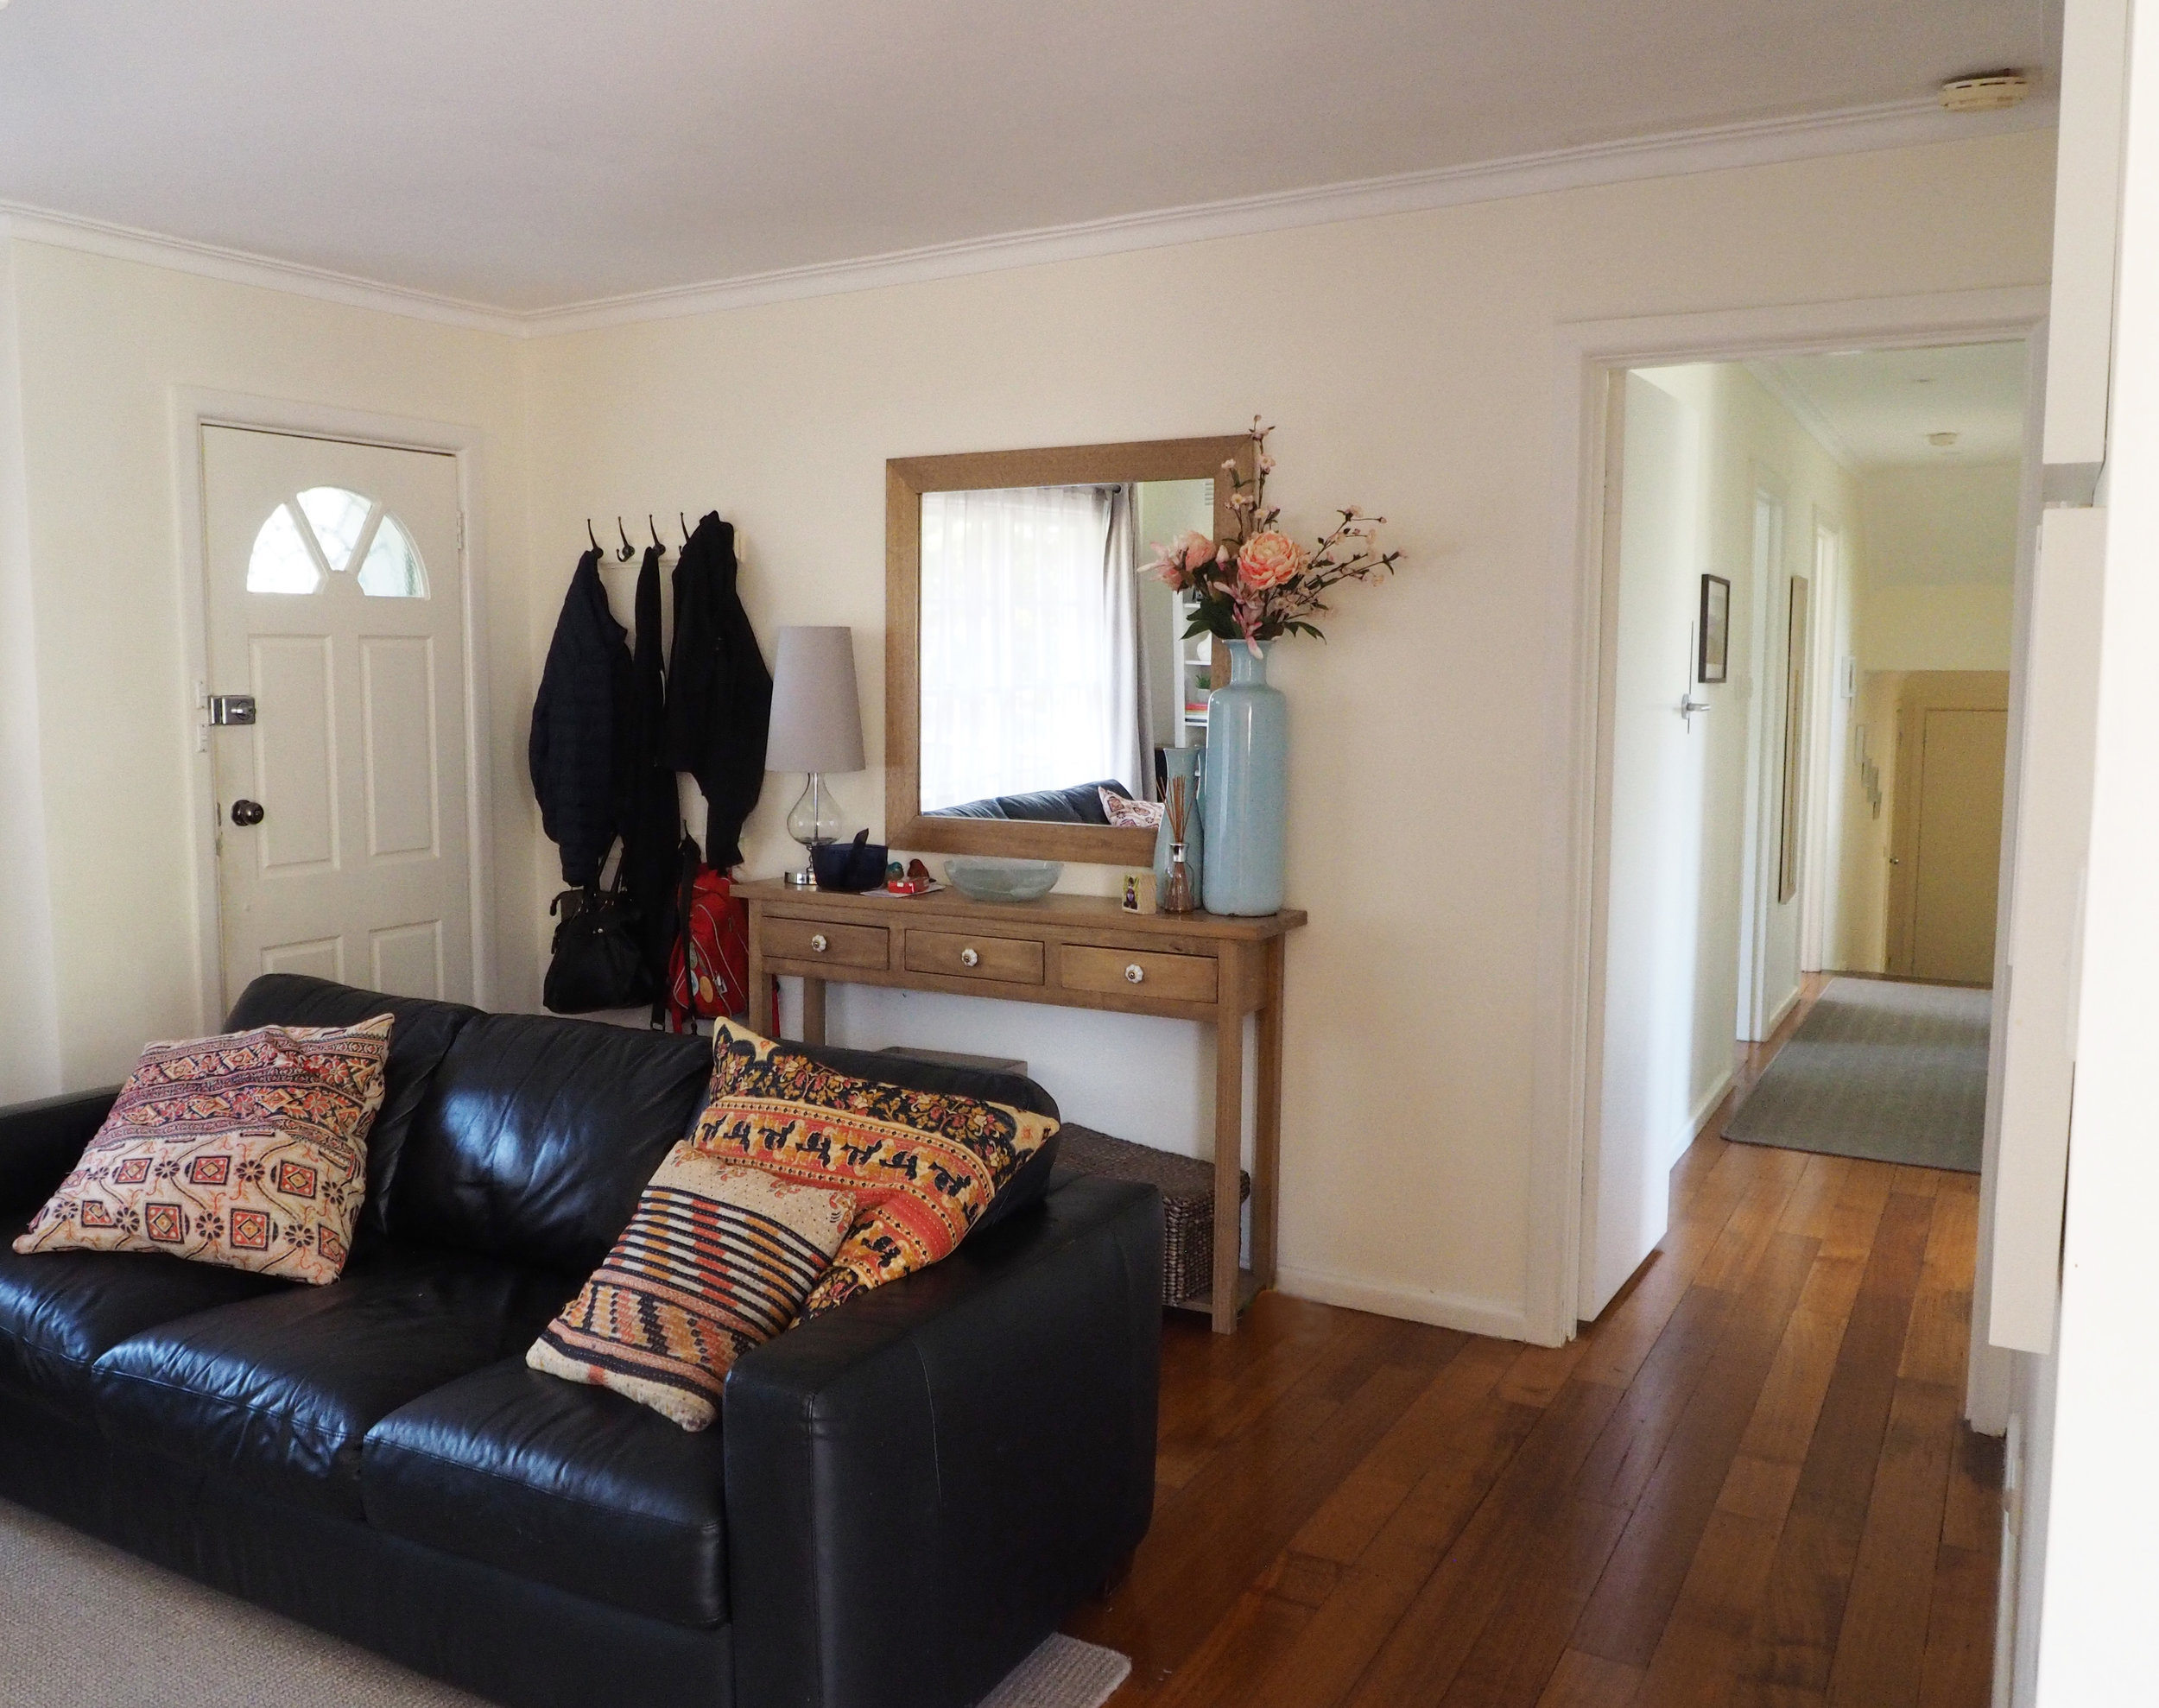 Original lounge room